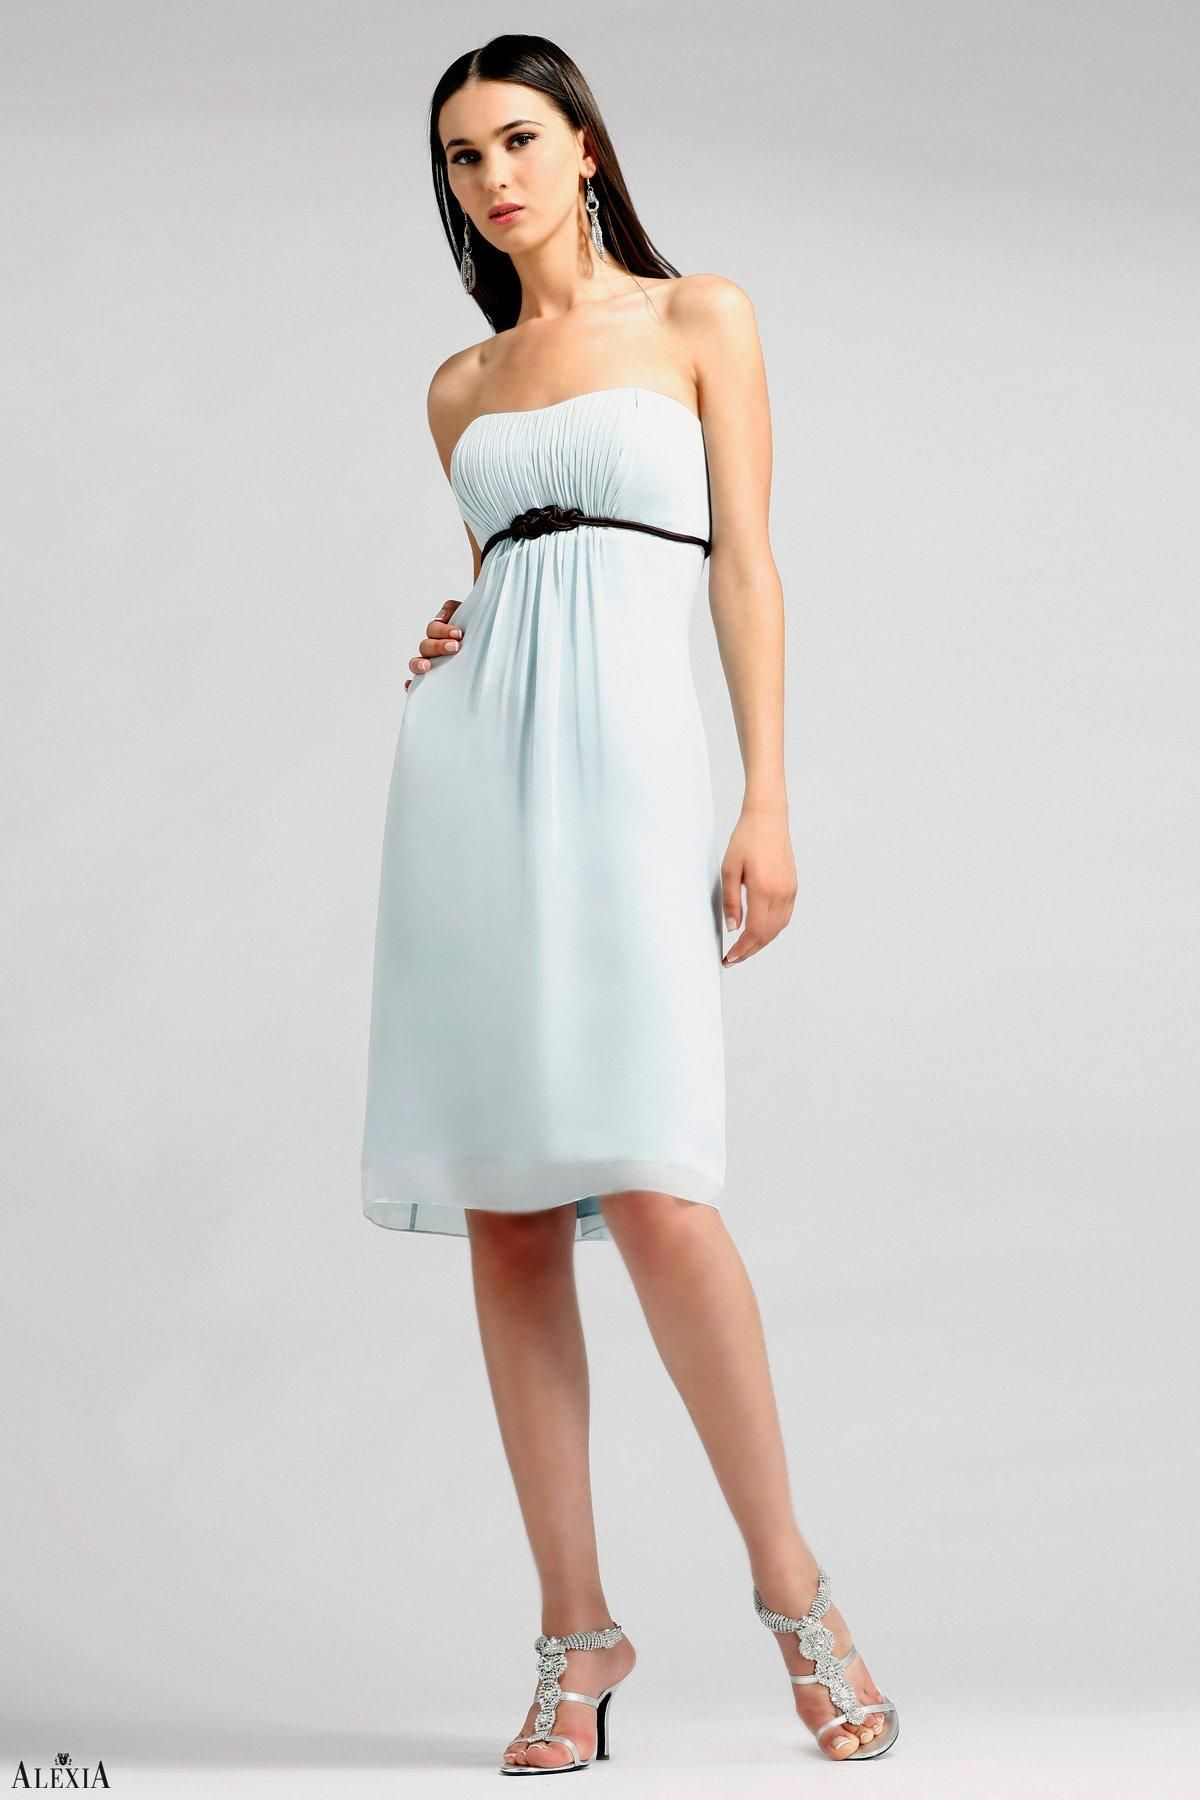 Alexia Designs Tea length dress wedding guest, Wedding